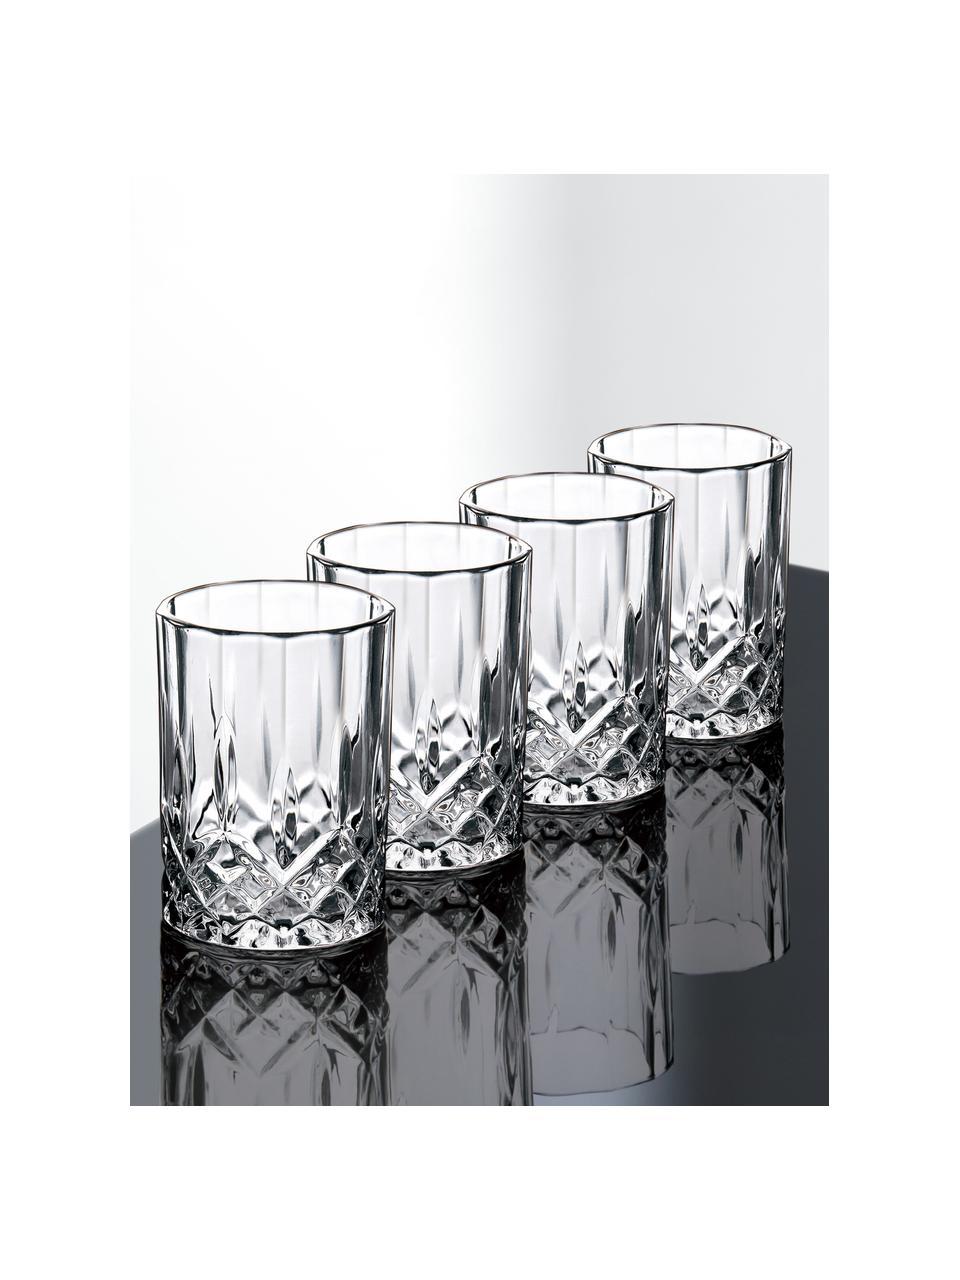 Schnapsgläser Harvey mit Relief, 4 Stück, Glas, Transparent, Ø 4 x H 6 cm